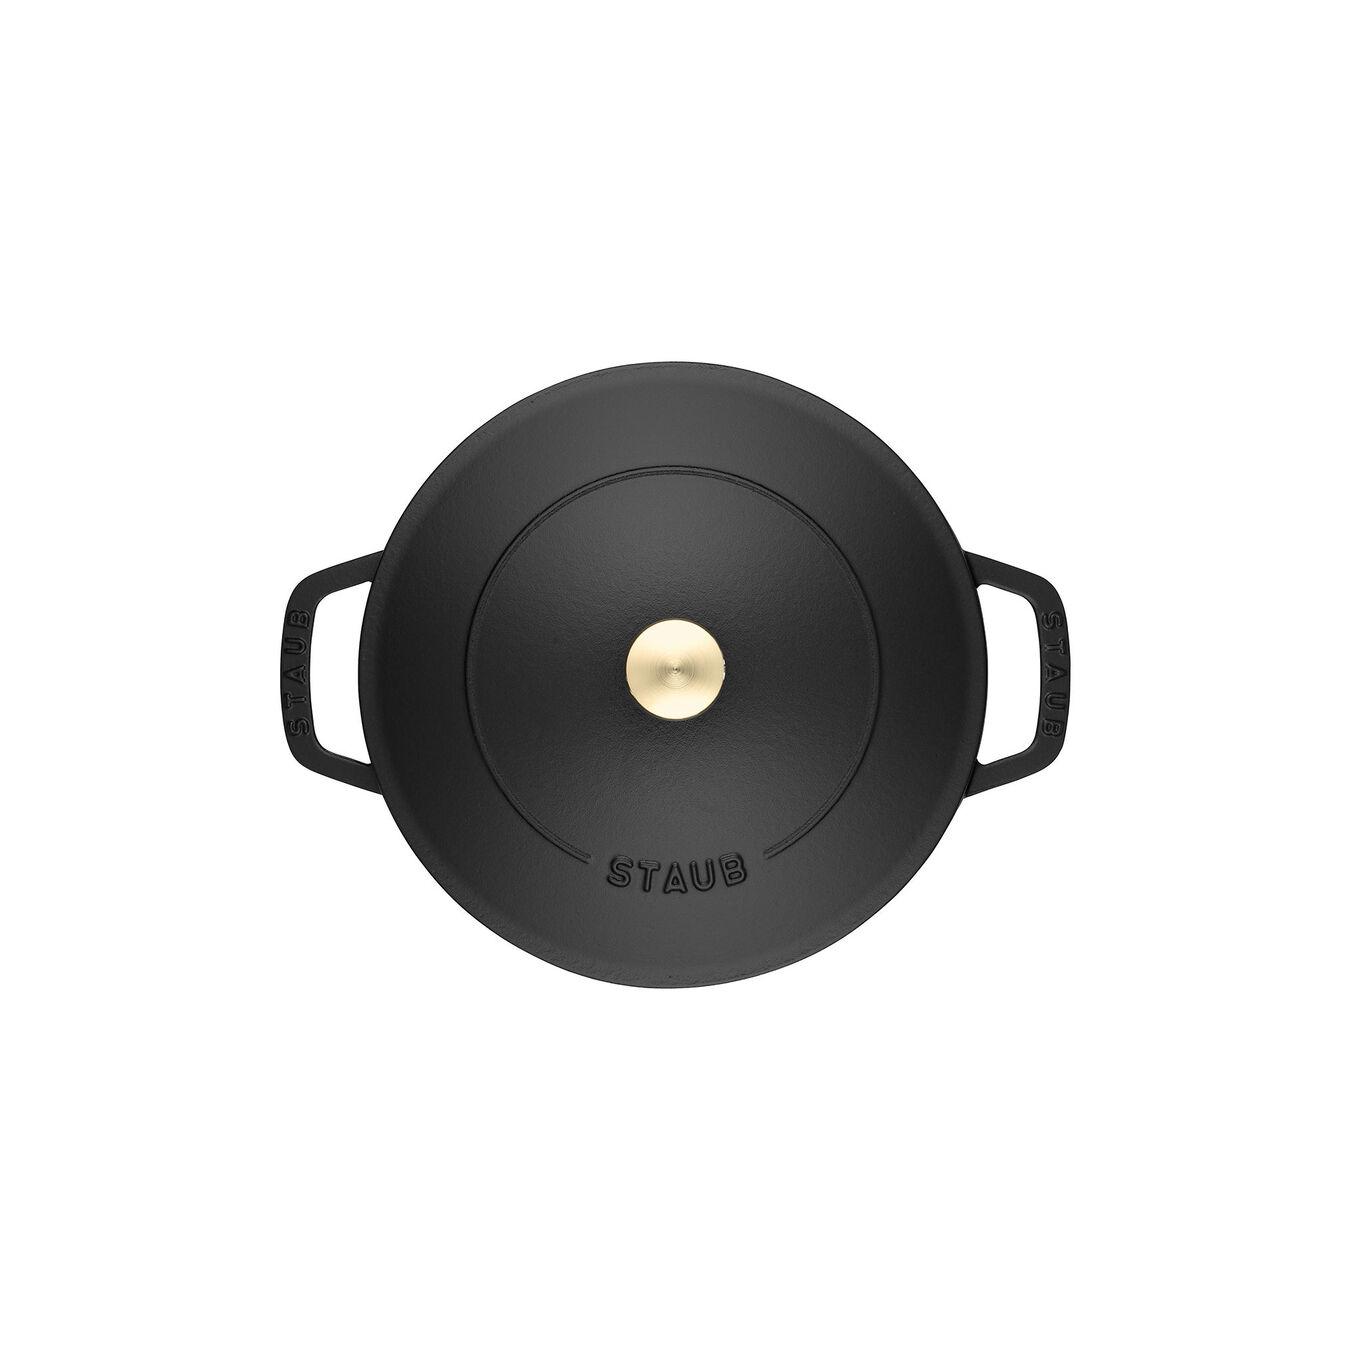 3,75 l Cast iron round Sauteuse Chistera, black,,large 5